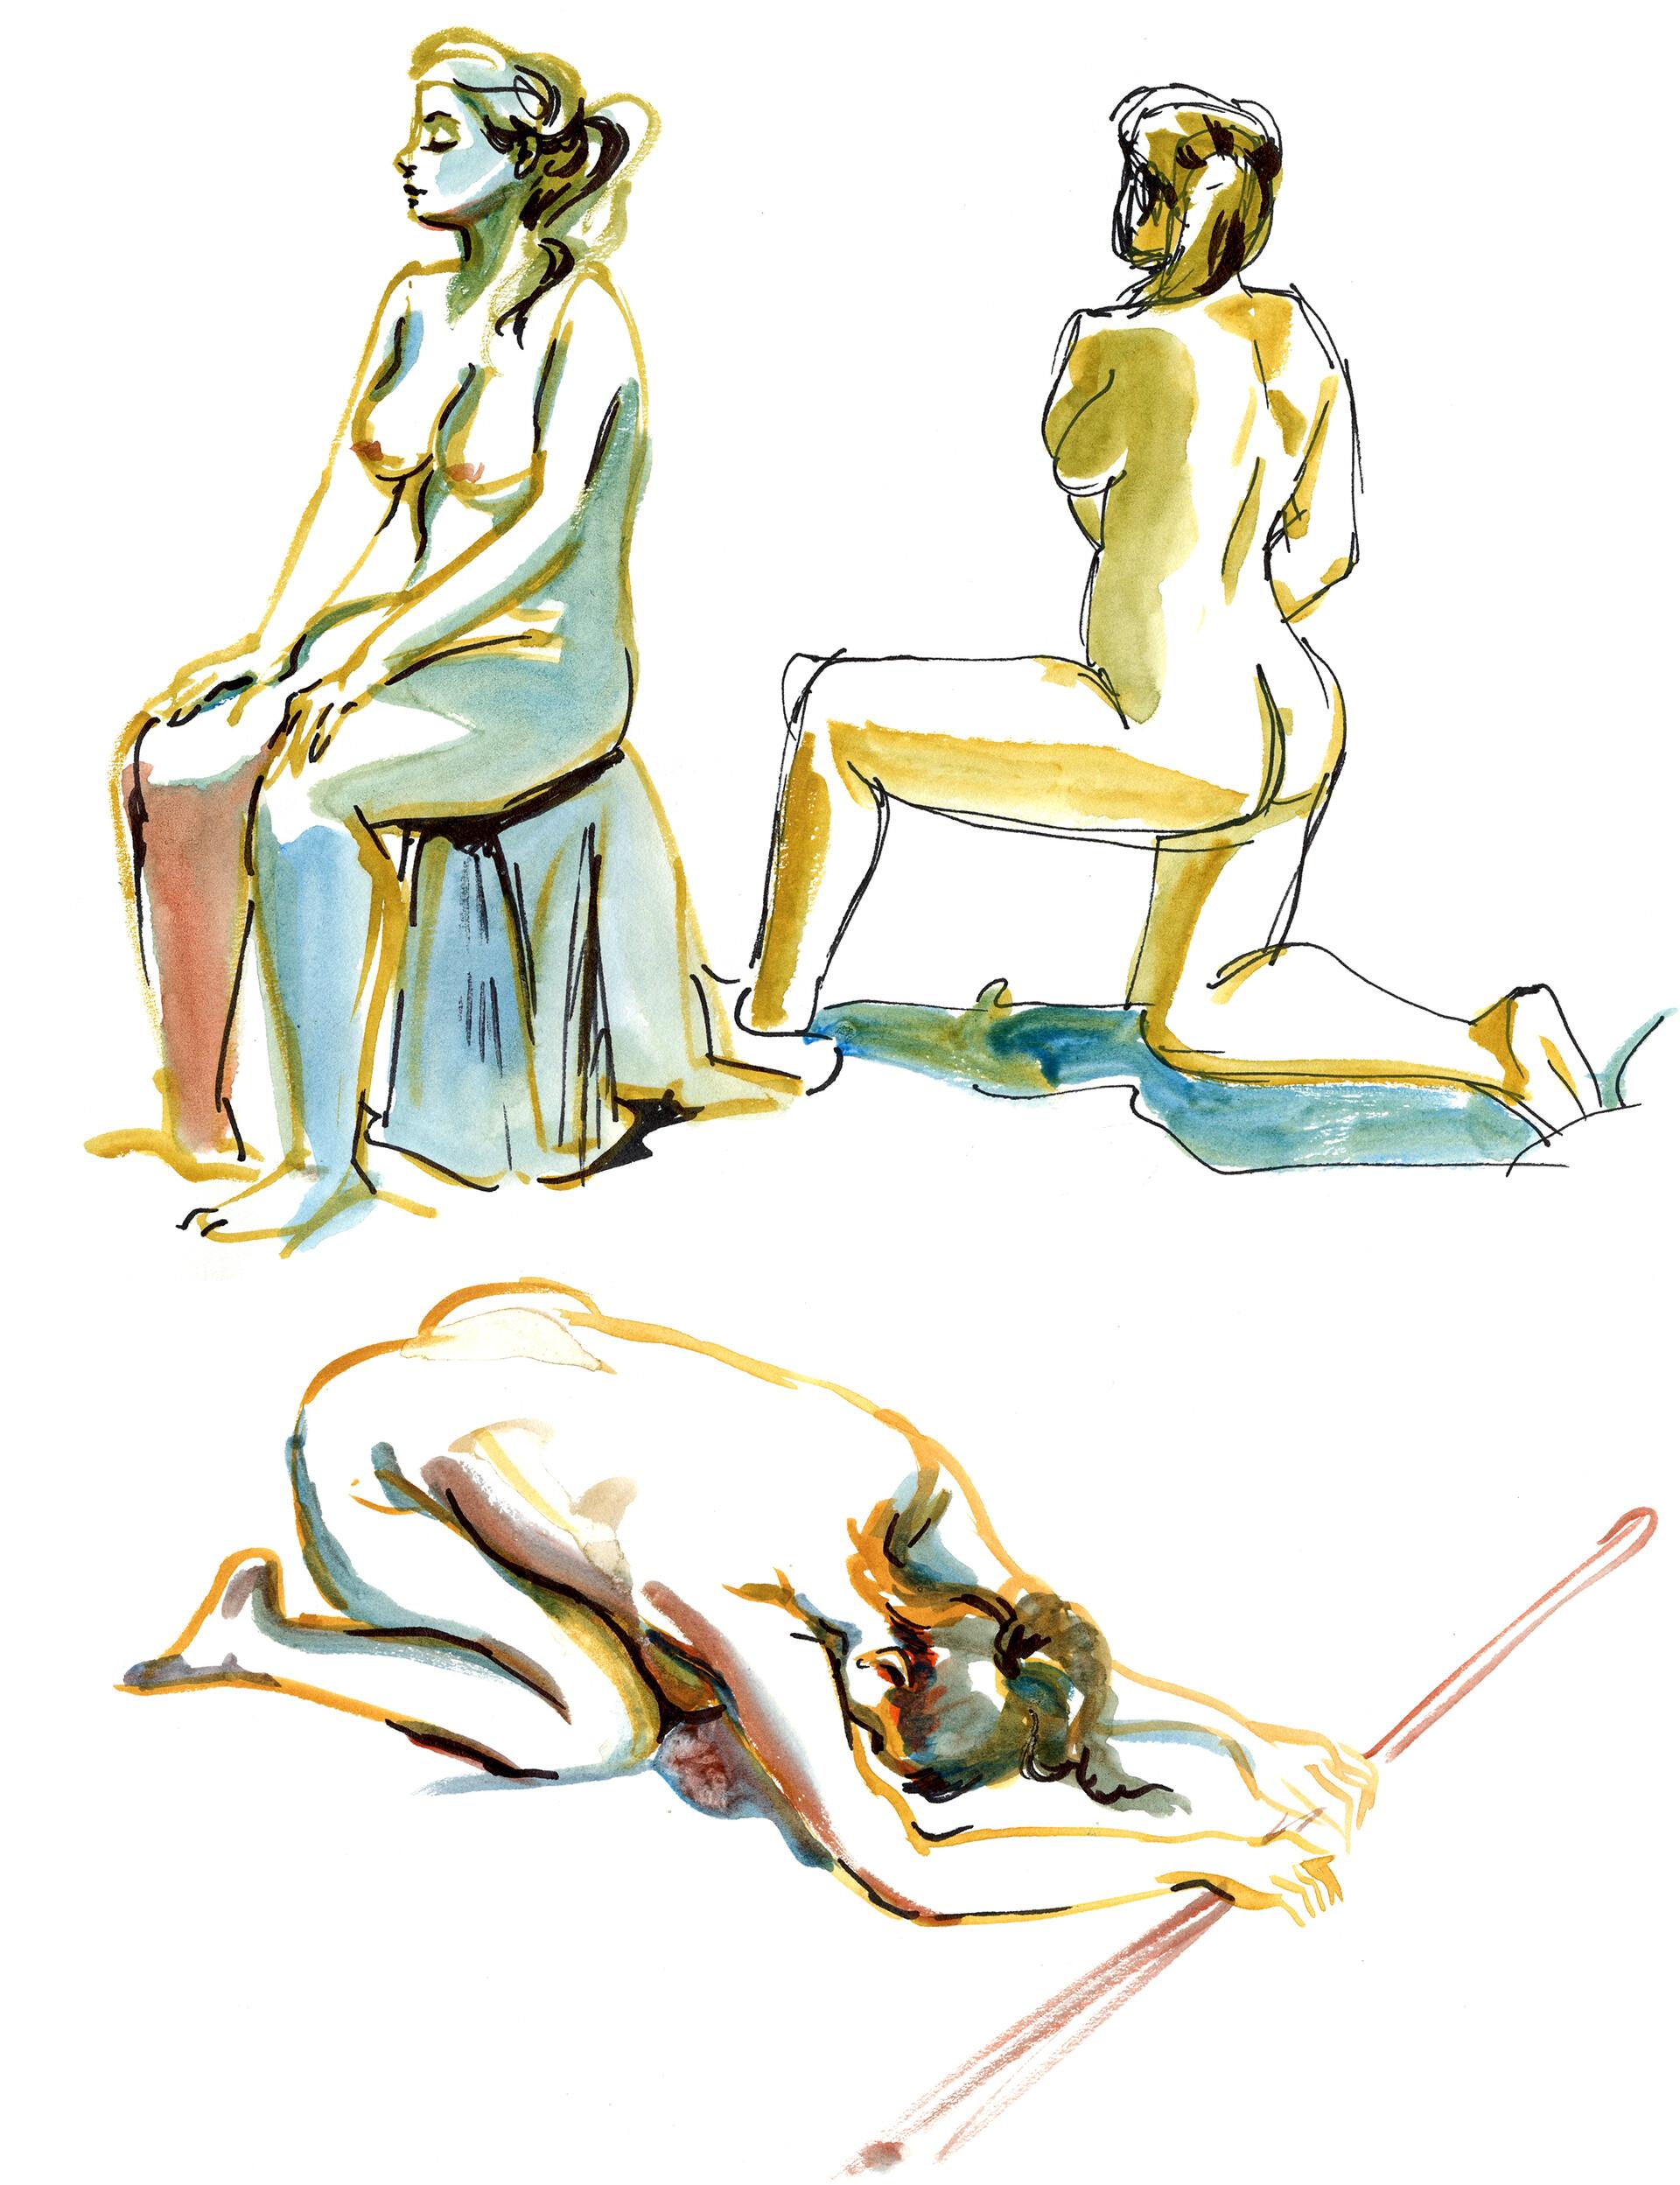 Elisa moriconi 3 06 giugno girl ink w studies 02